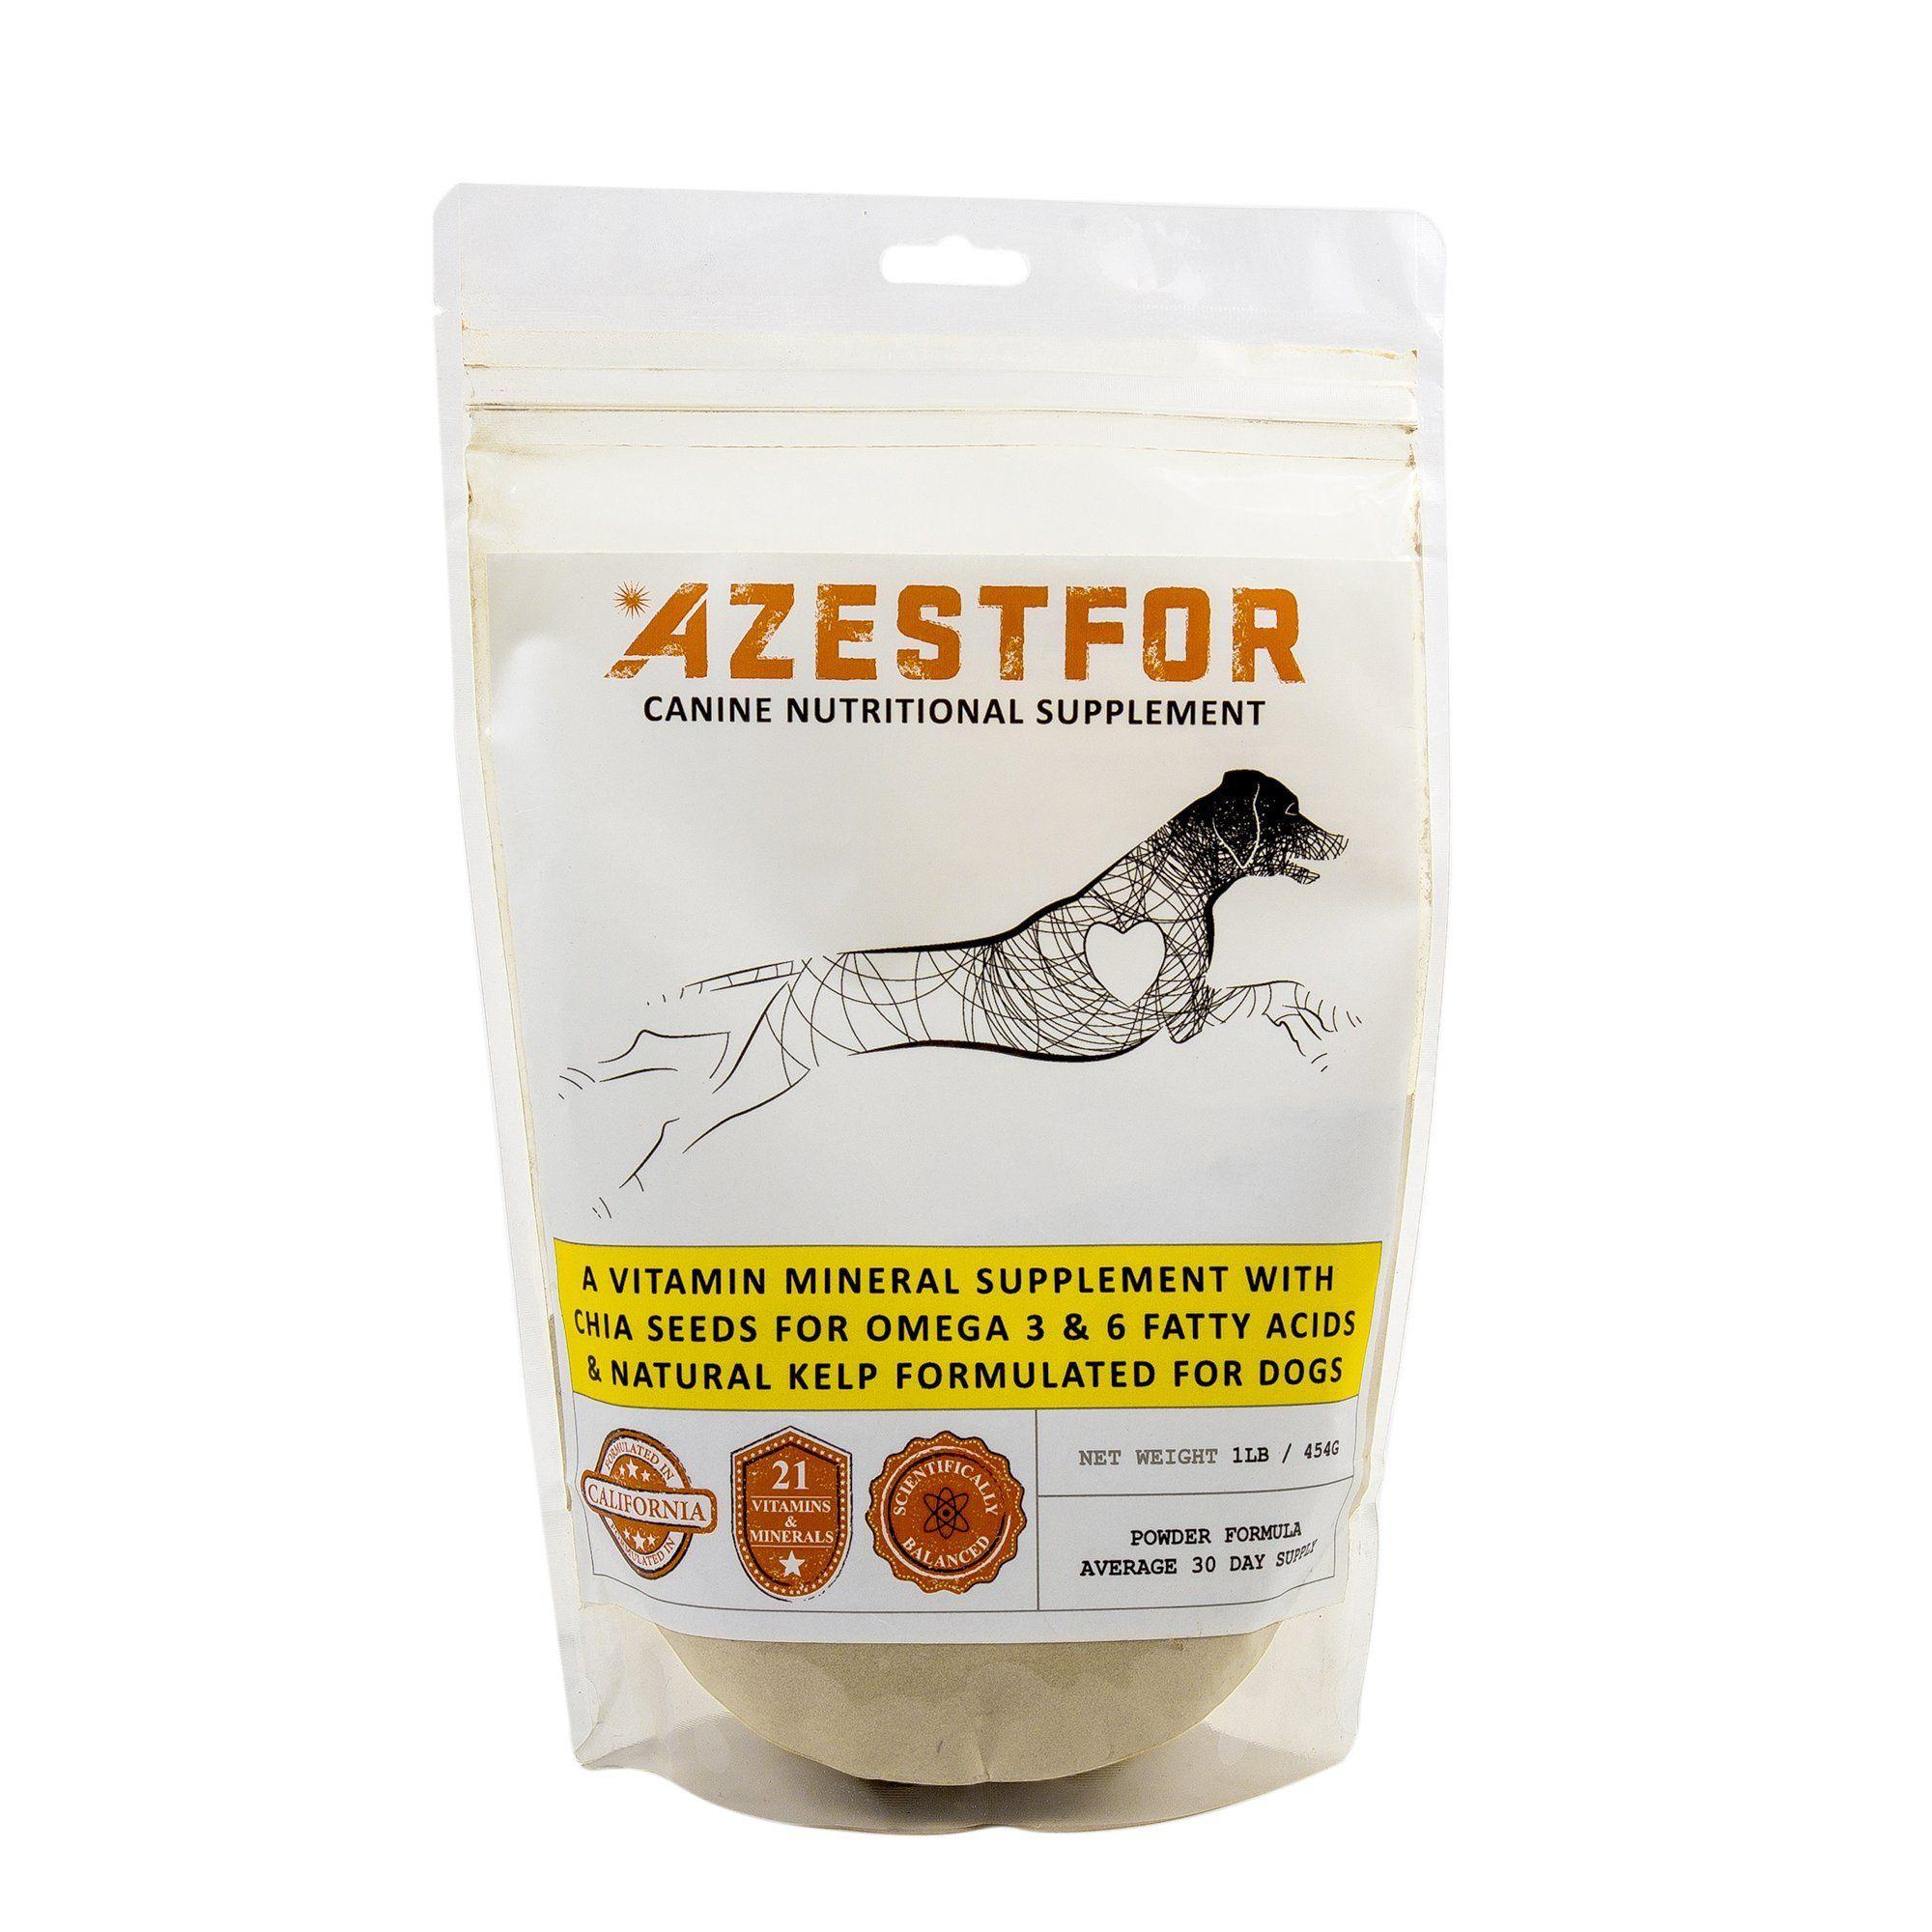 Azestfor Canine Nutritional Supplements Homemade Dog Food Vitamins Homemade Dog Homemade Dog Food Dog Vitamins